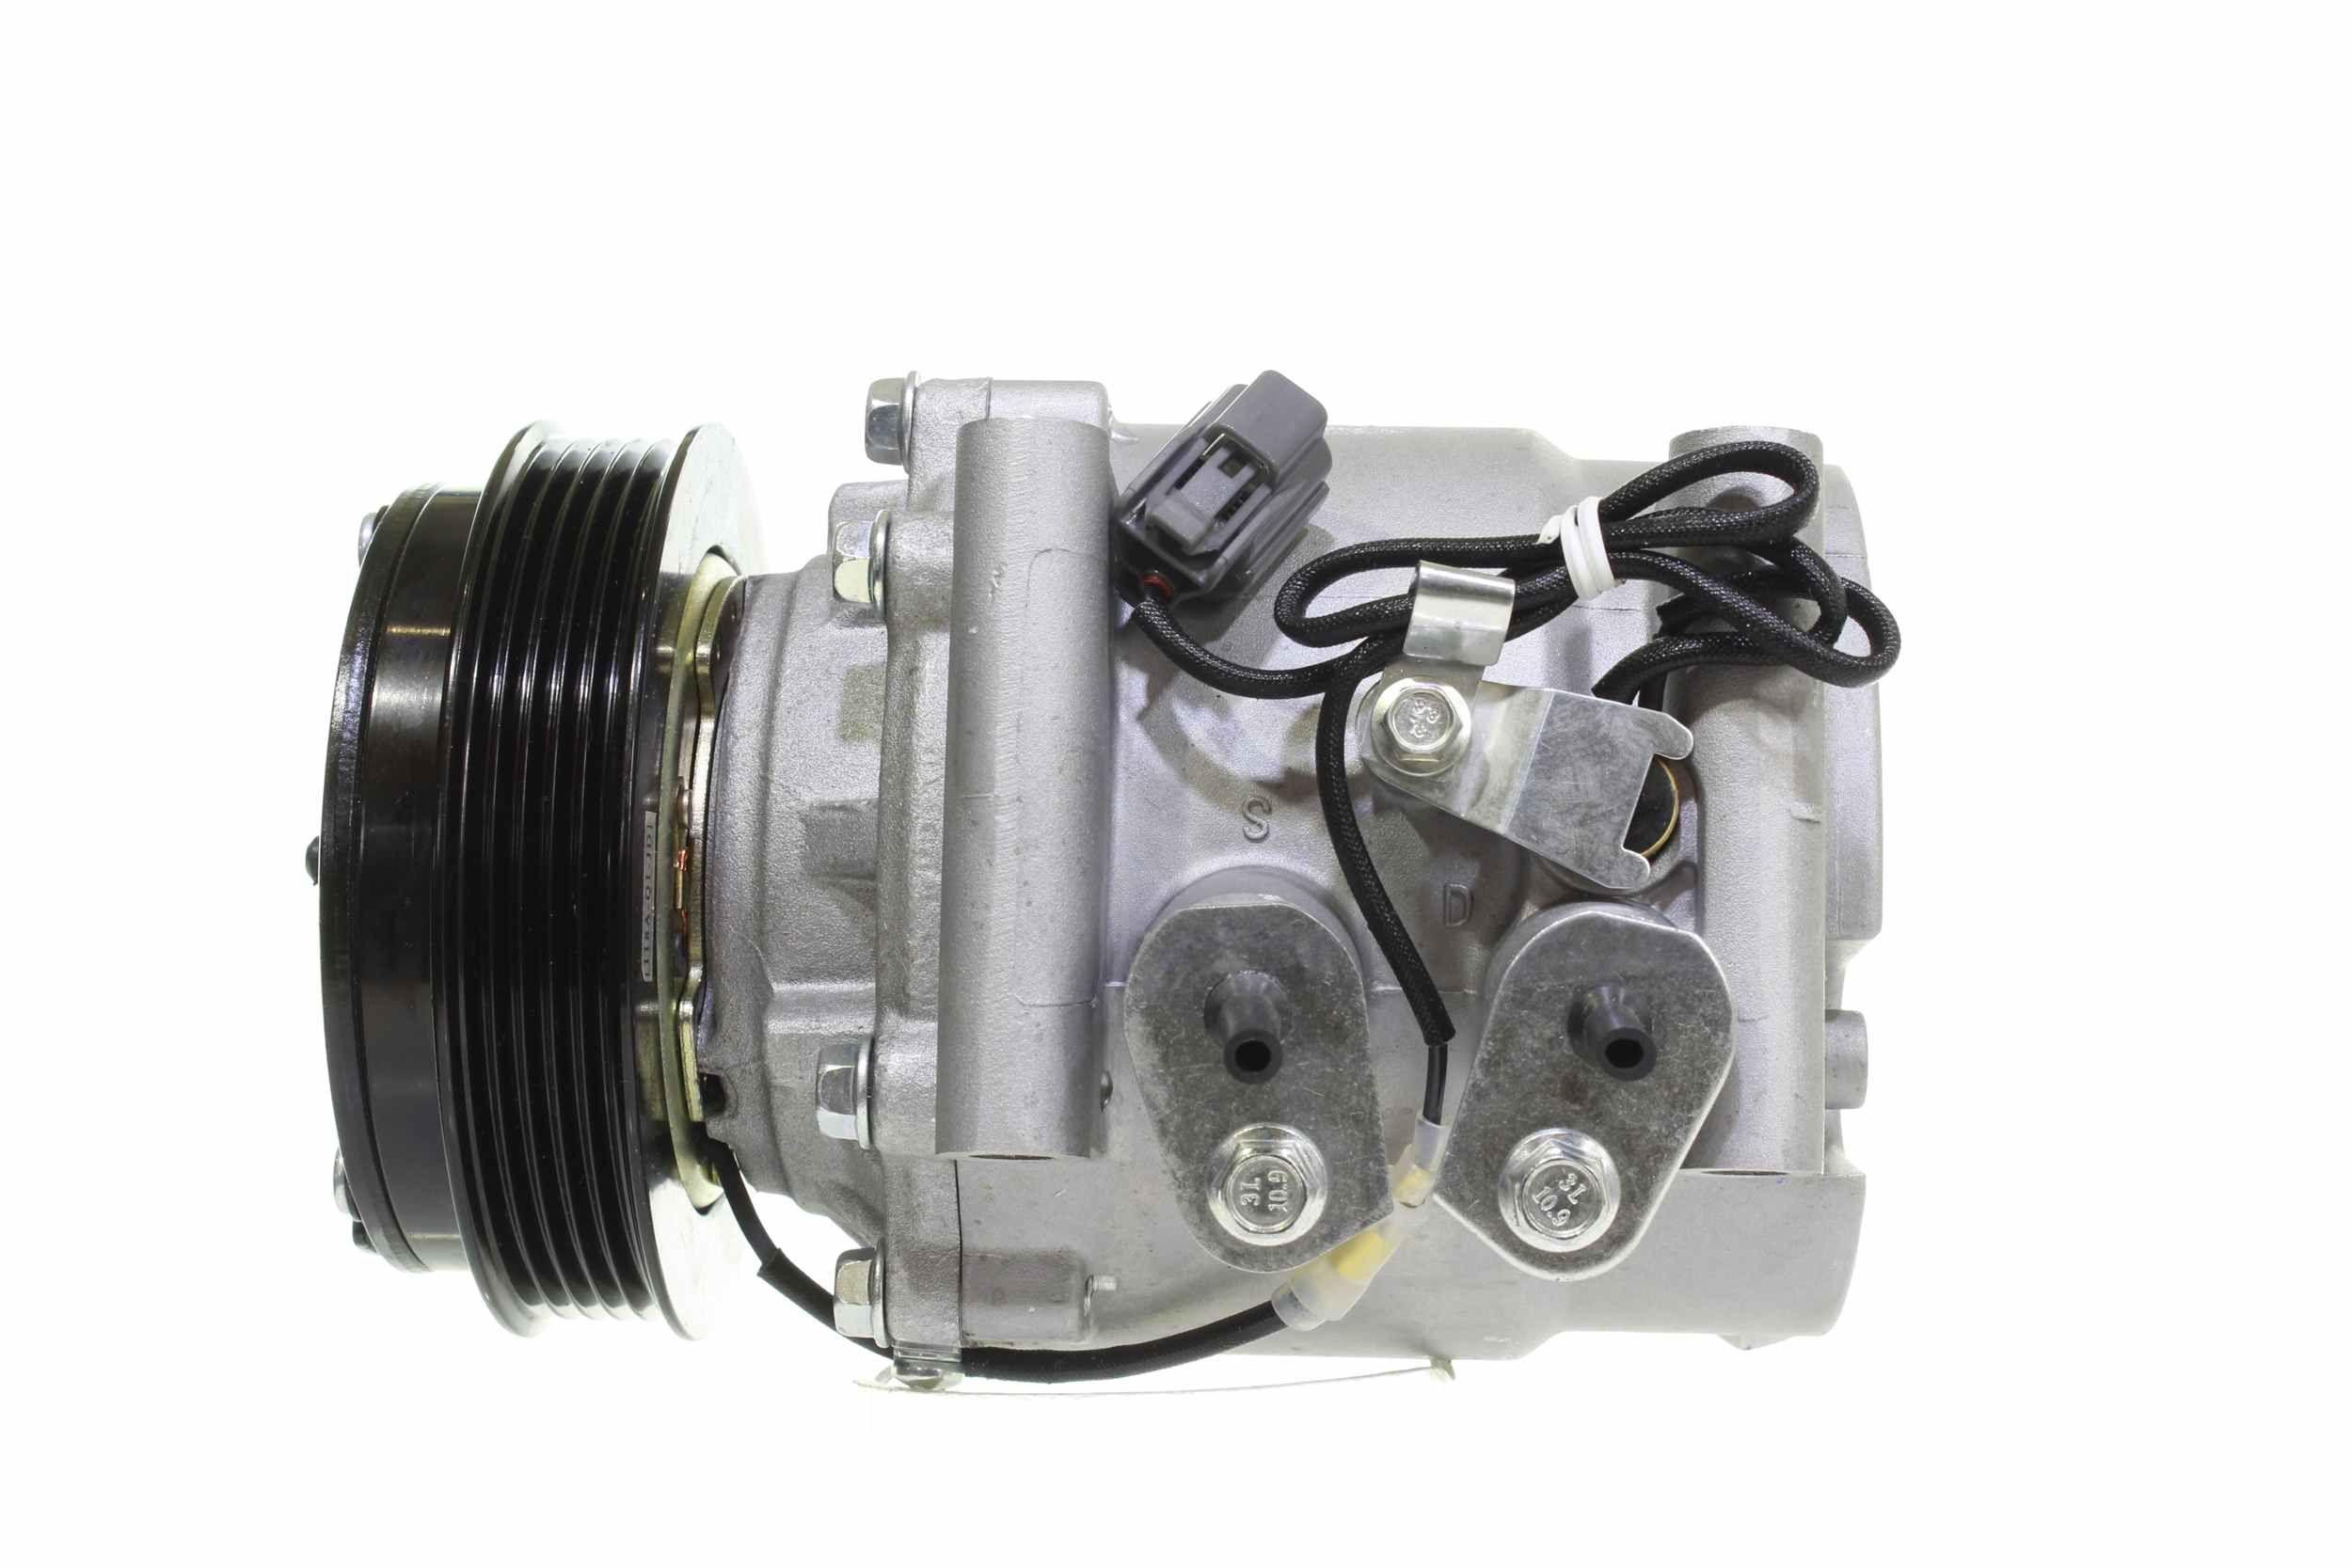 LKW Klimakompressor ALANKO 10550754 kaufen